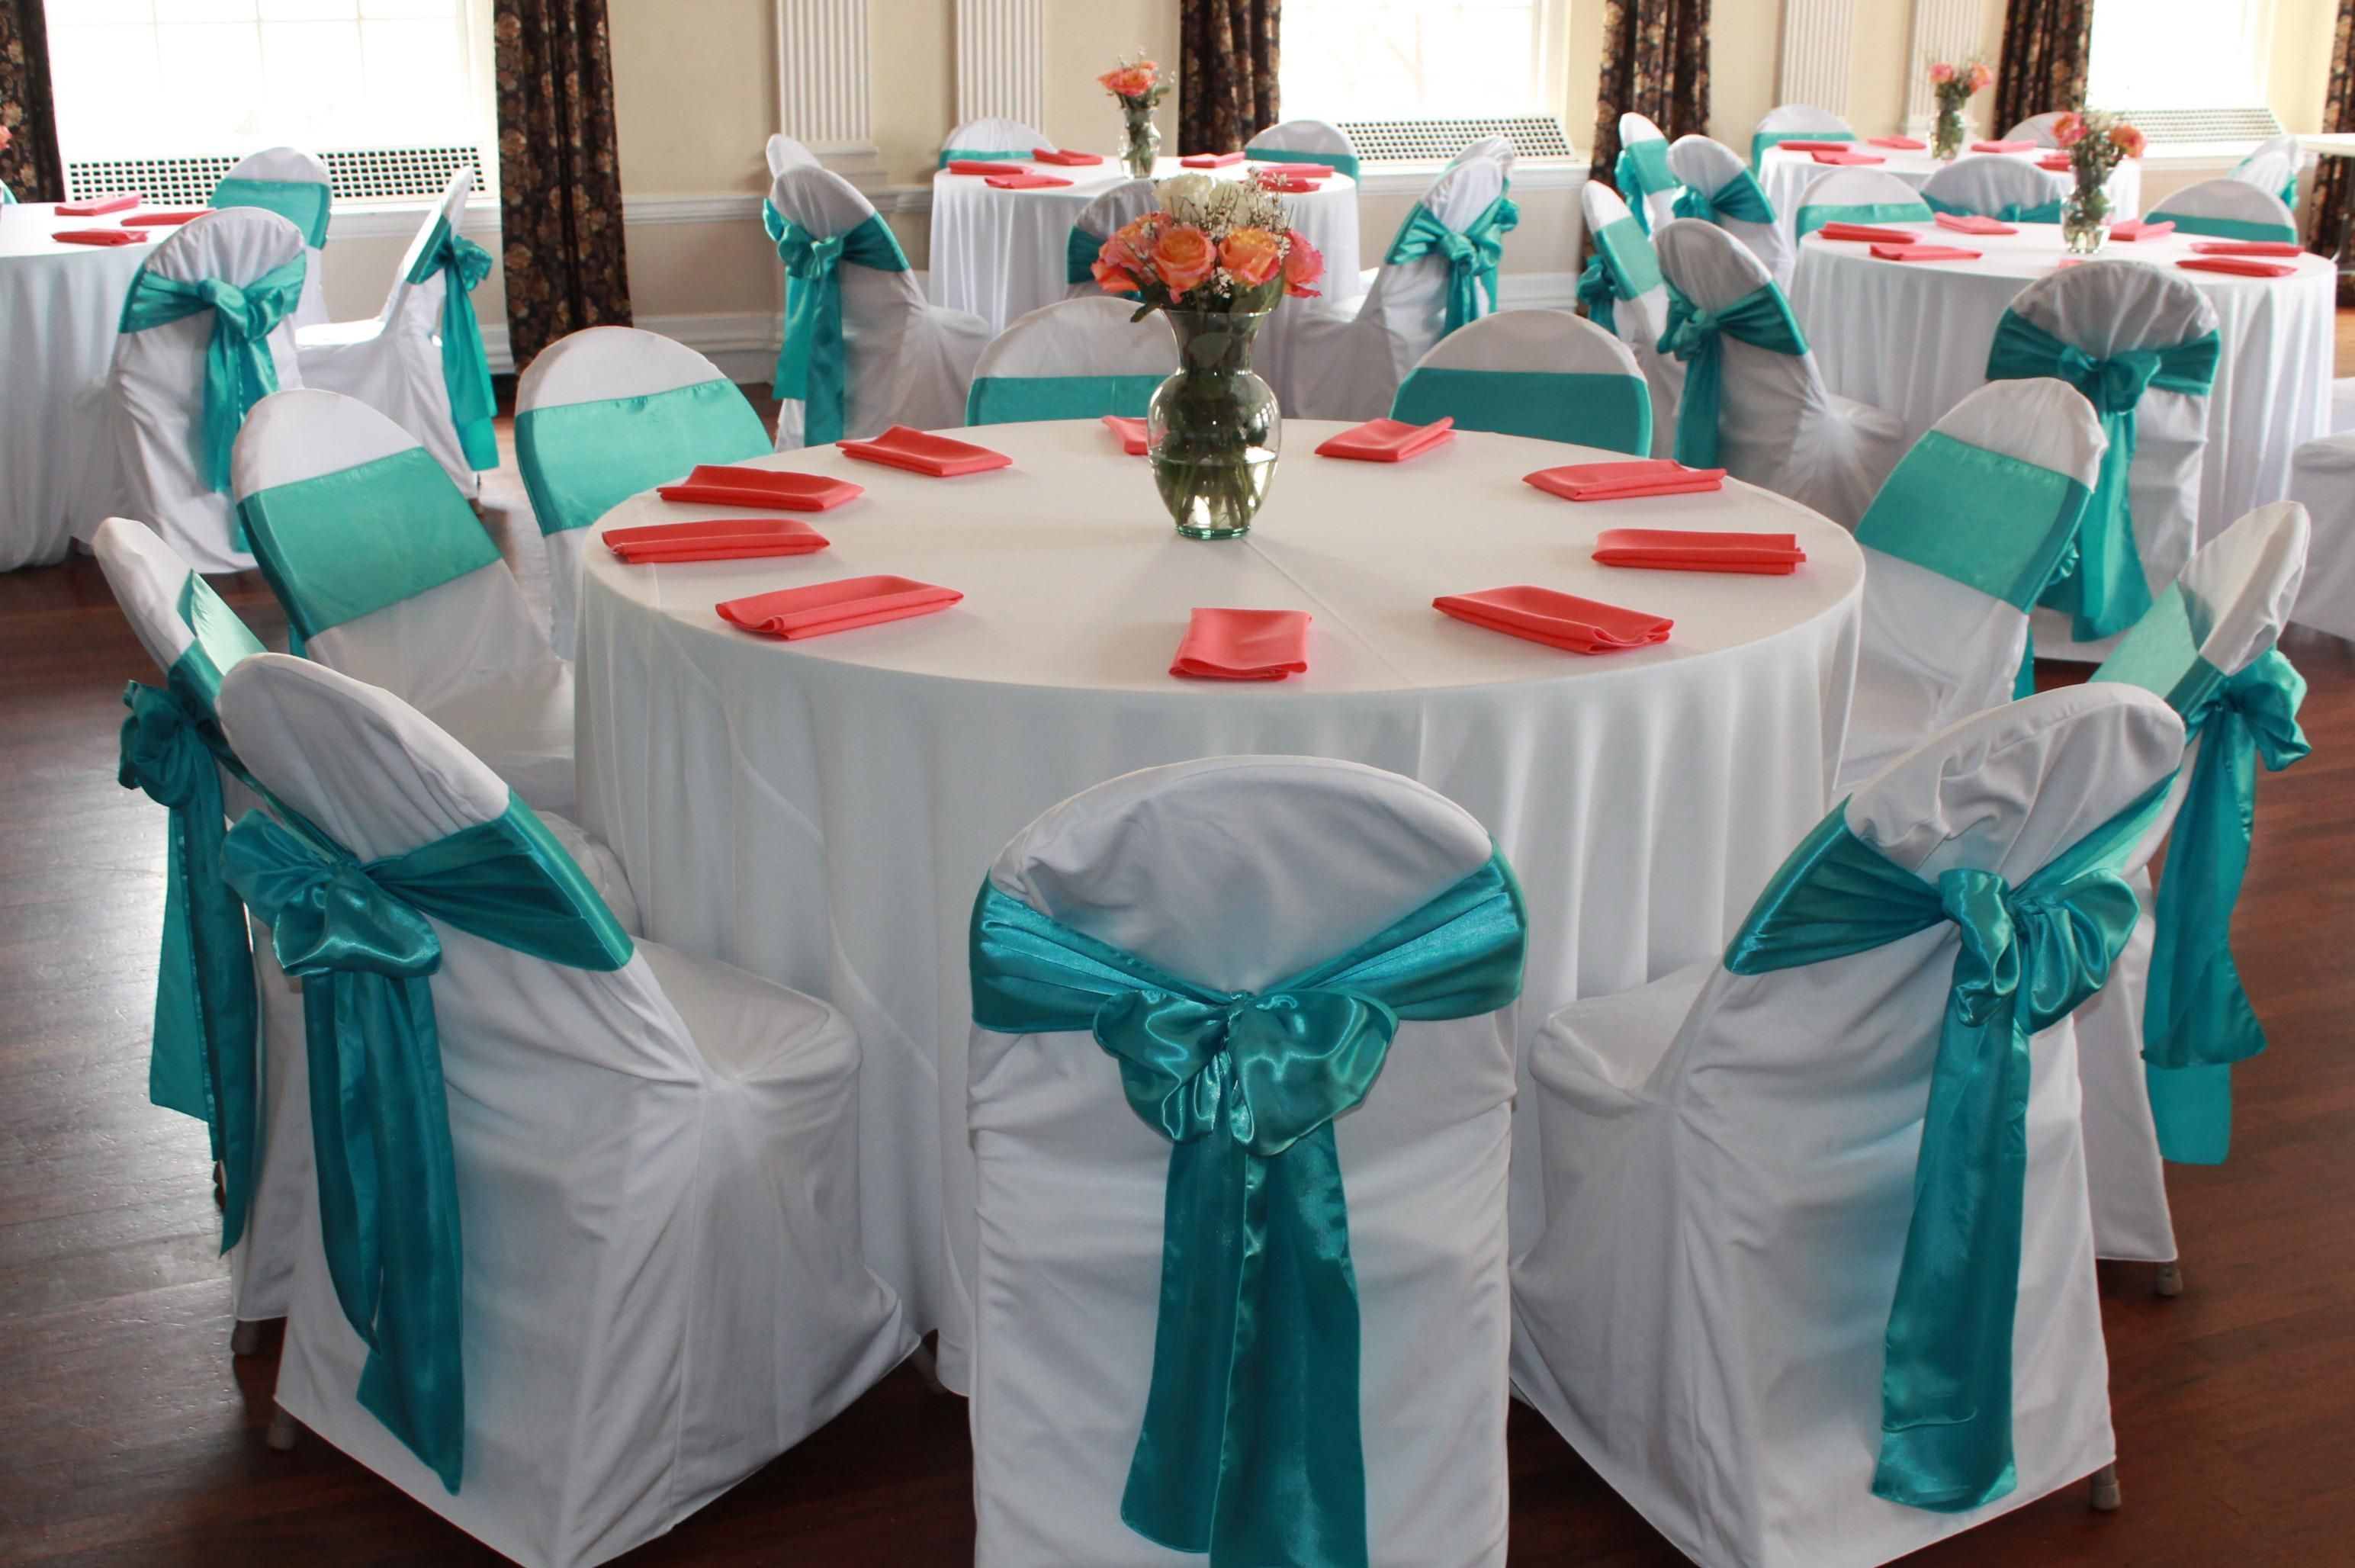 Outstanding Turquoise Teal Satin Sash In 2019 Satin Sashes Wedding Machost Co Dining Chair Design Ideas Machostcouk